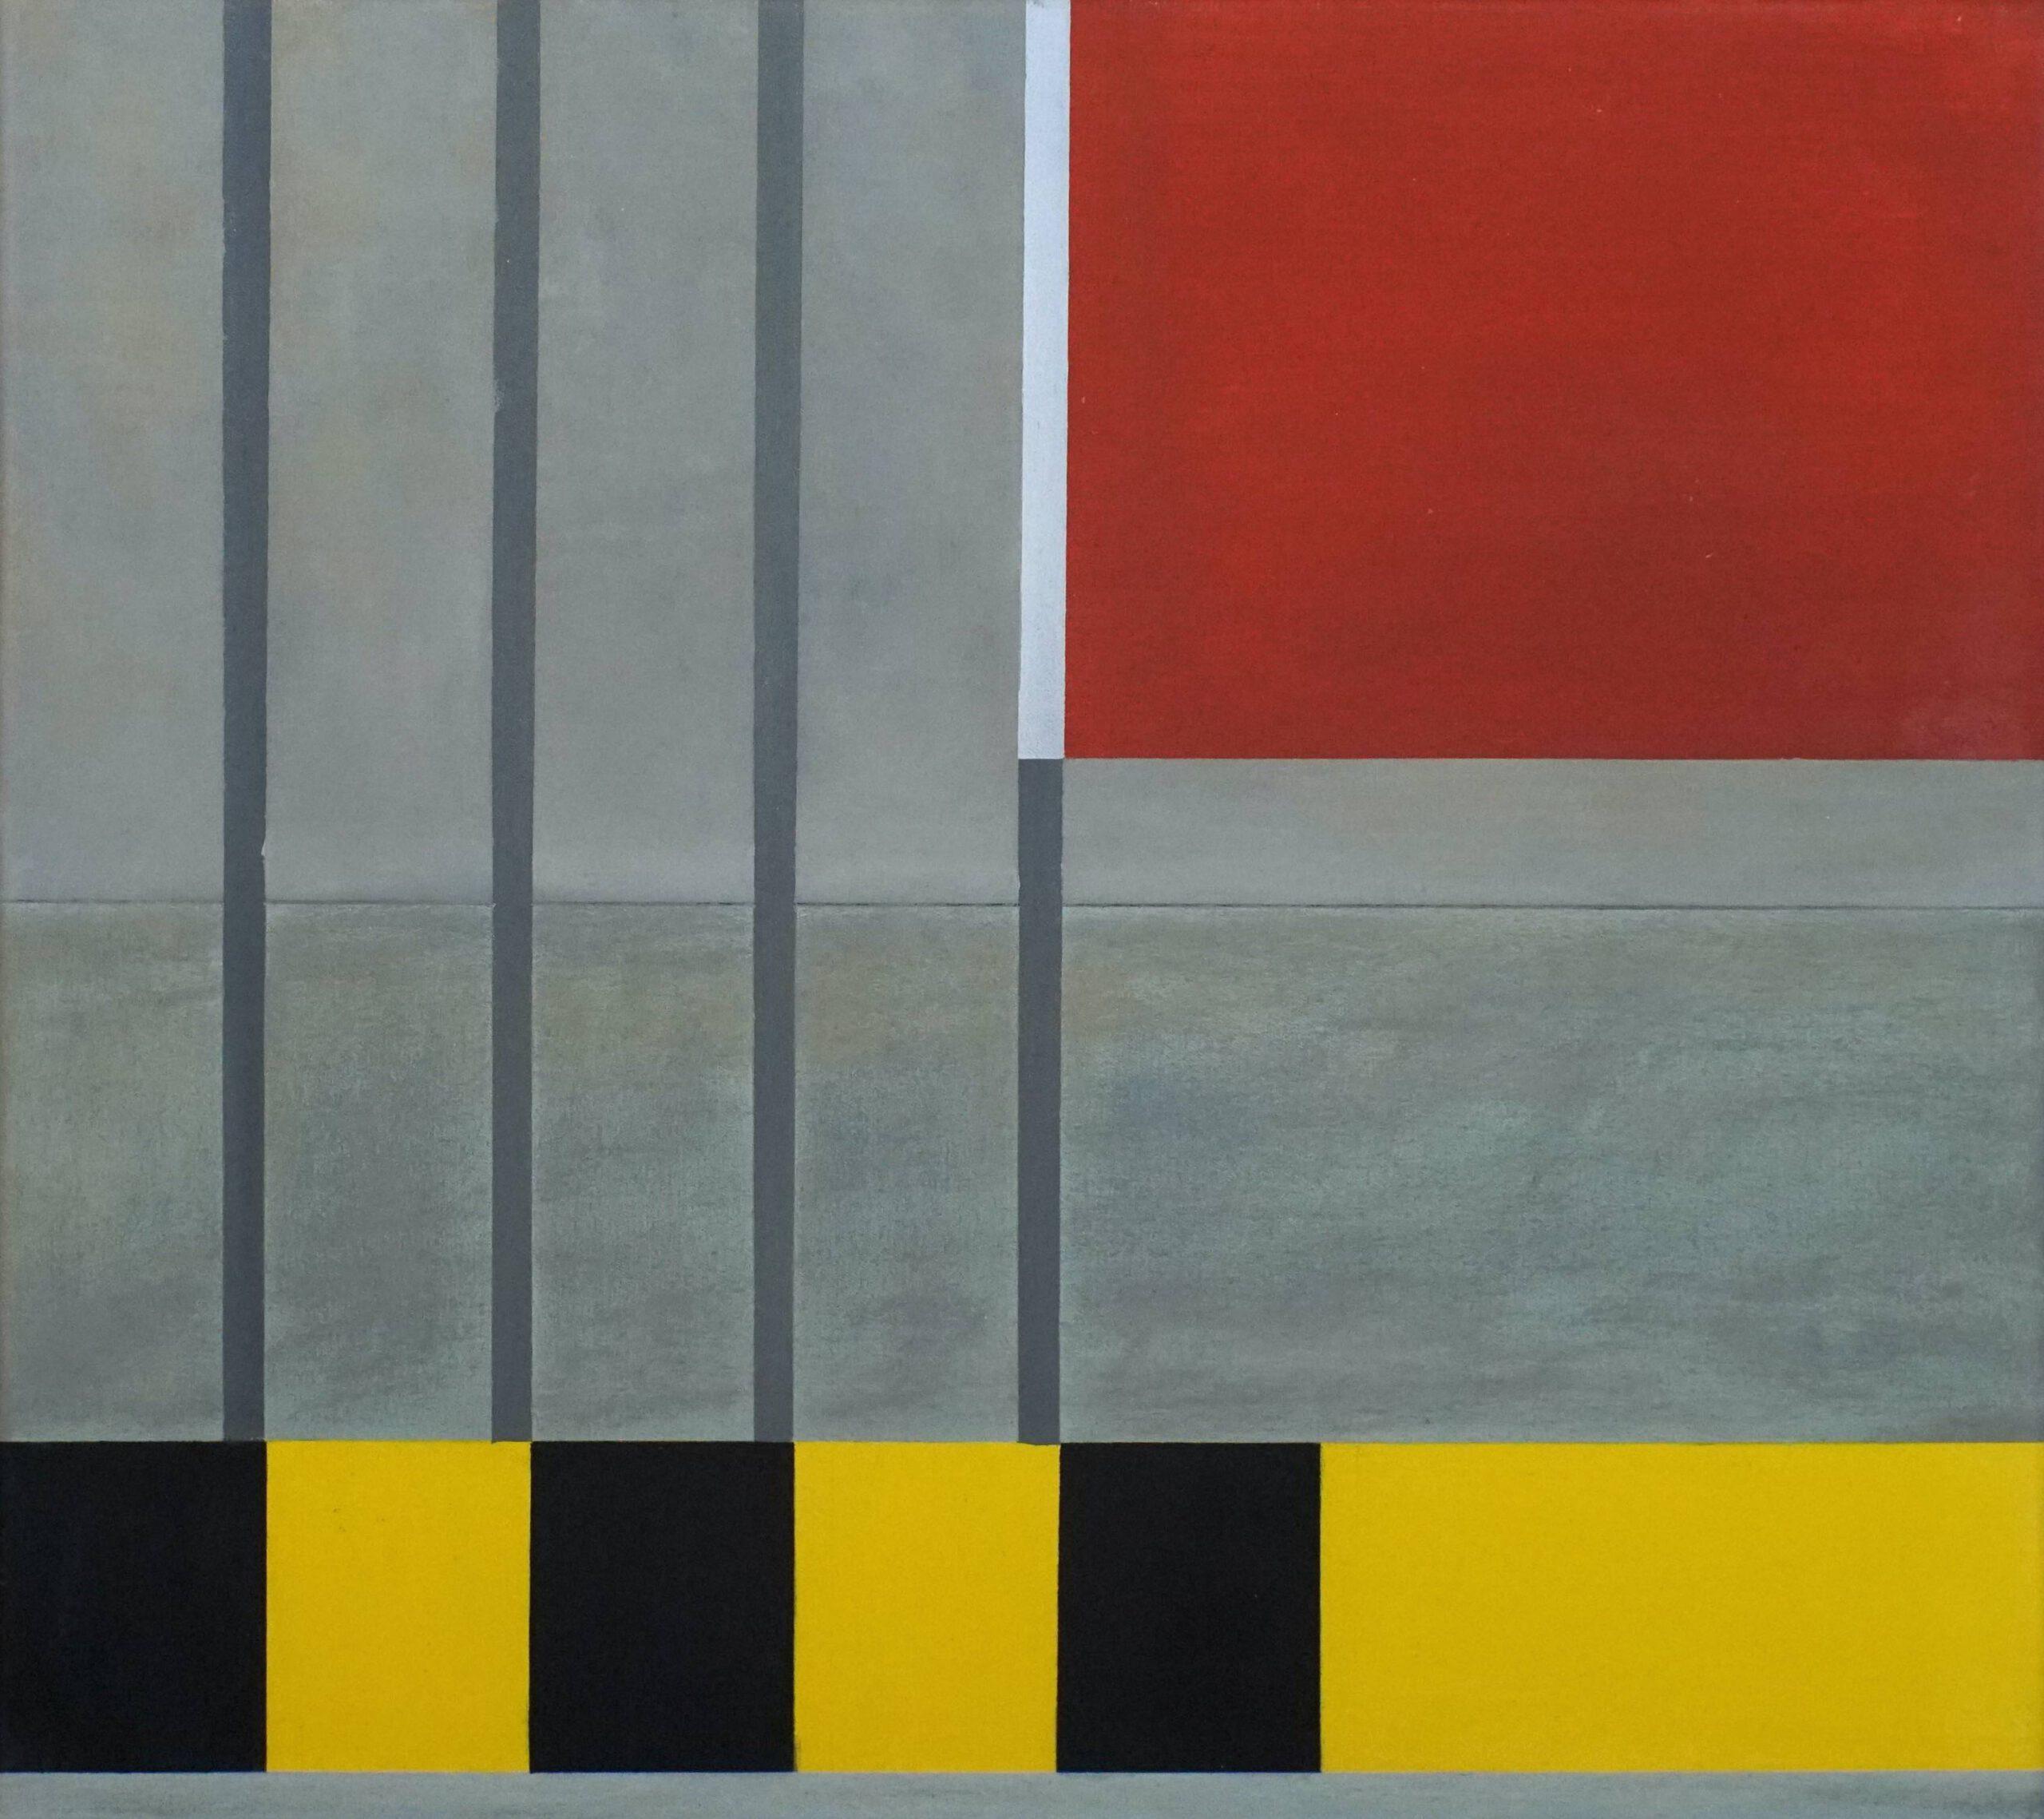 Dumaguete II,  2018, 45 x 50 cm, Öl/Lw, Oil on Canvas